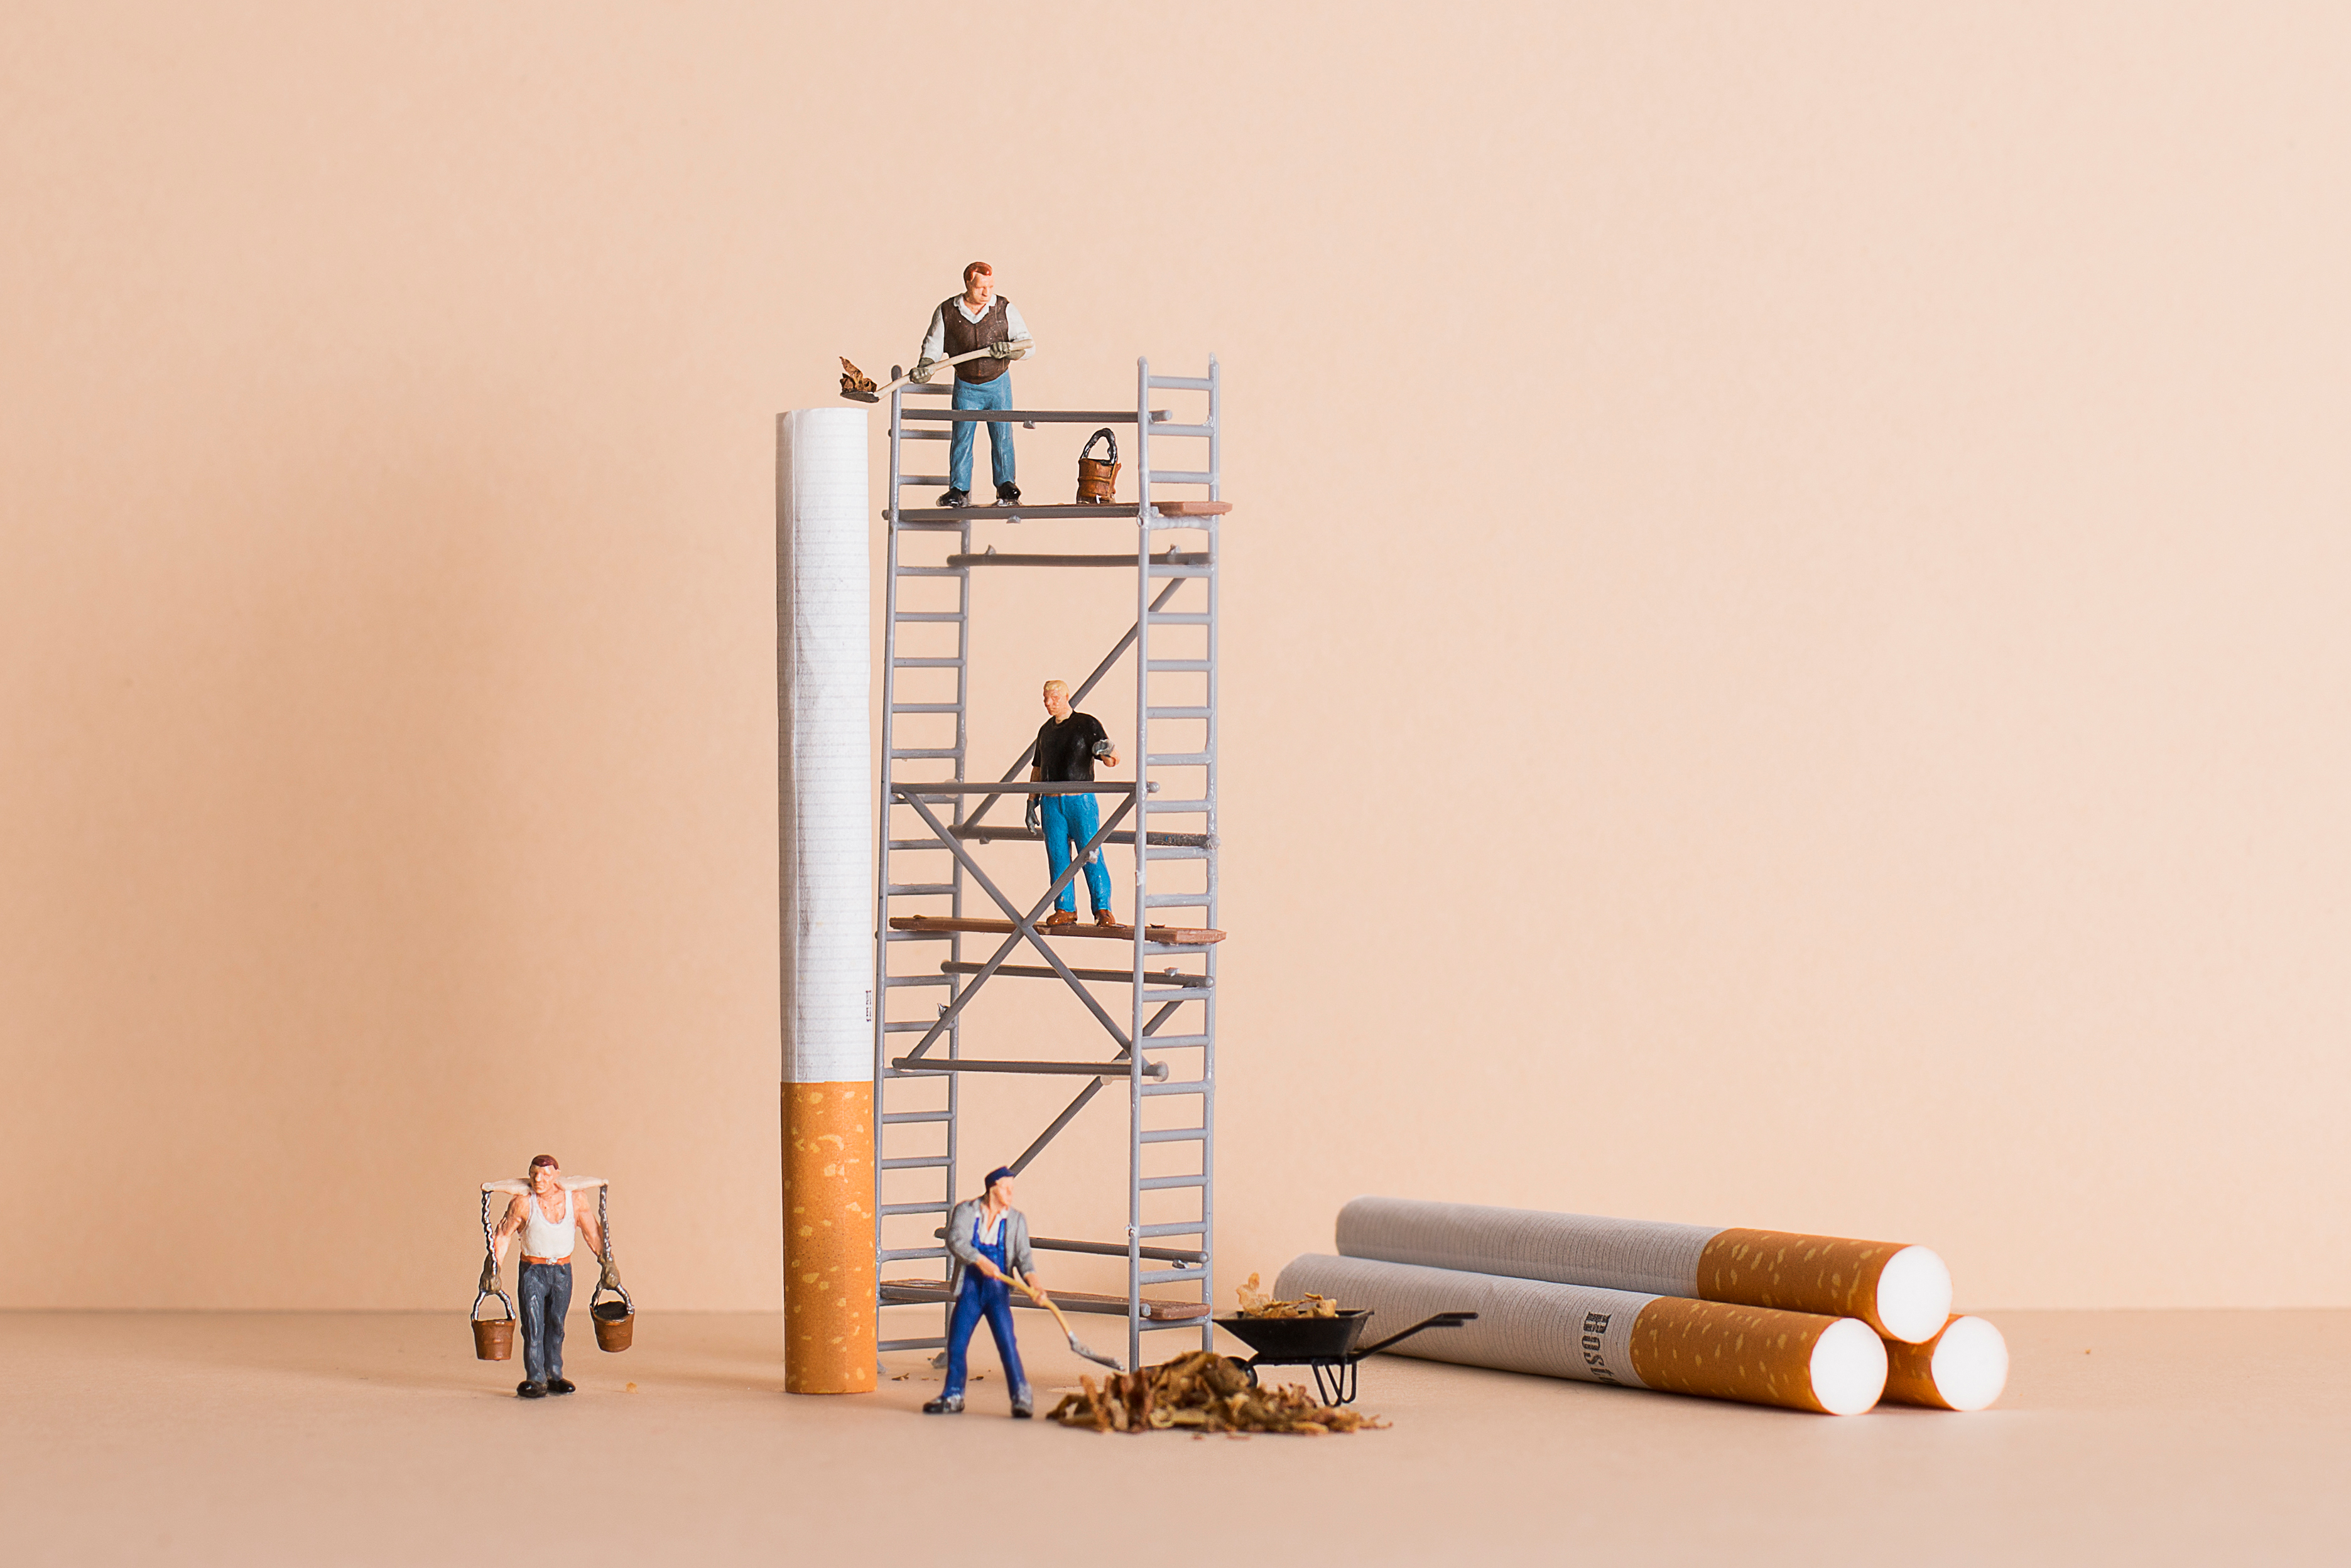 Zigarrettenfabrik scharf